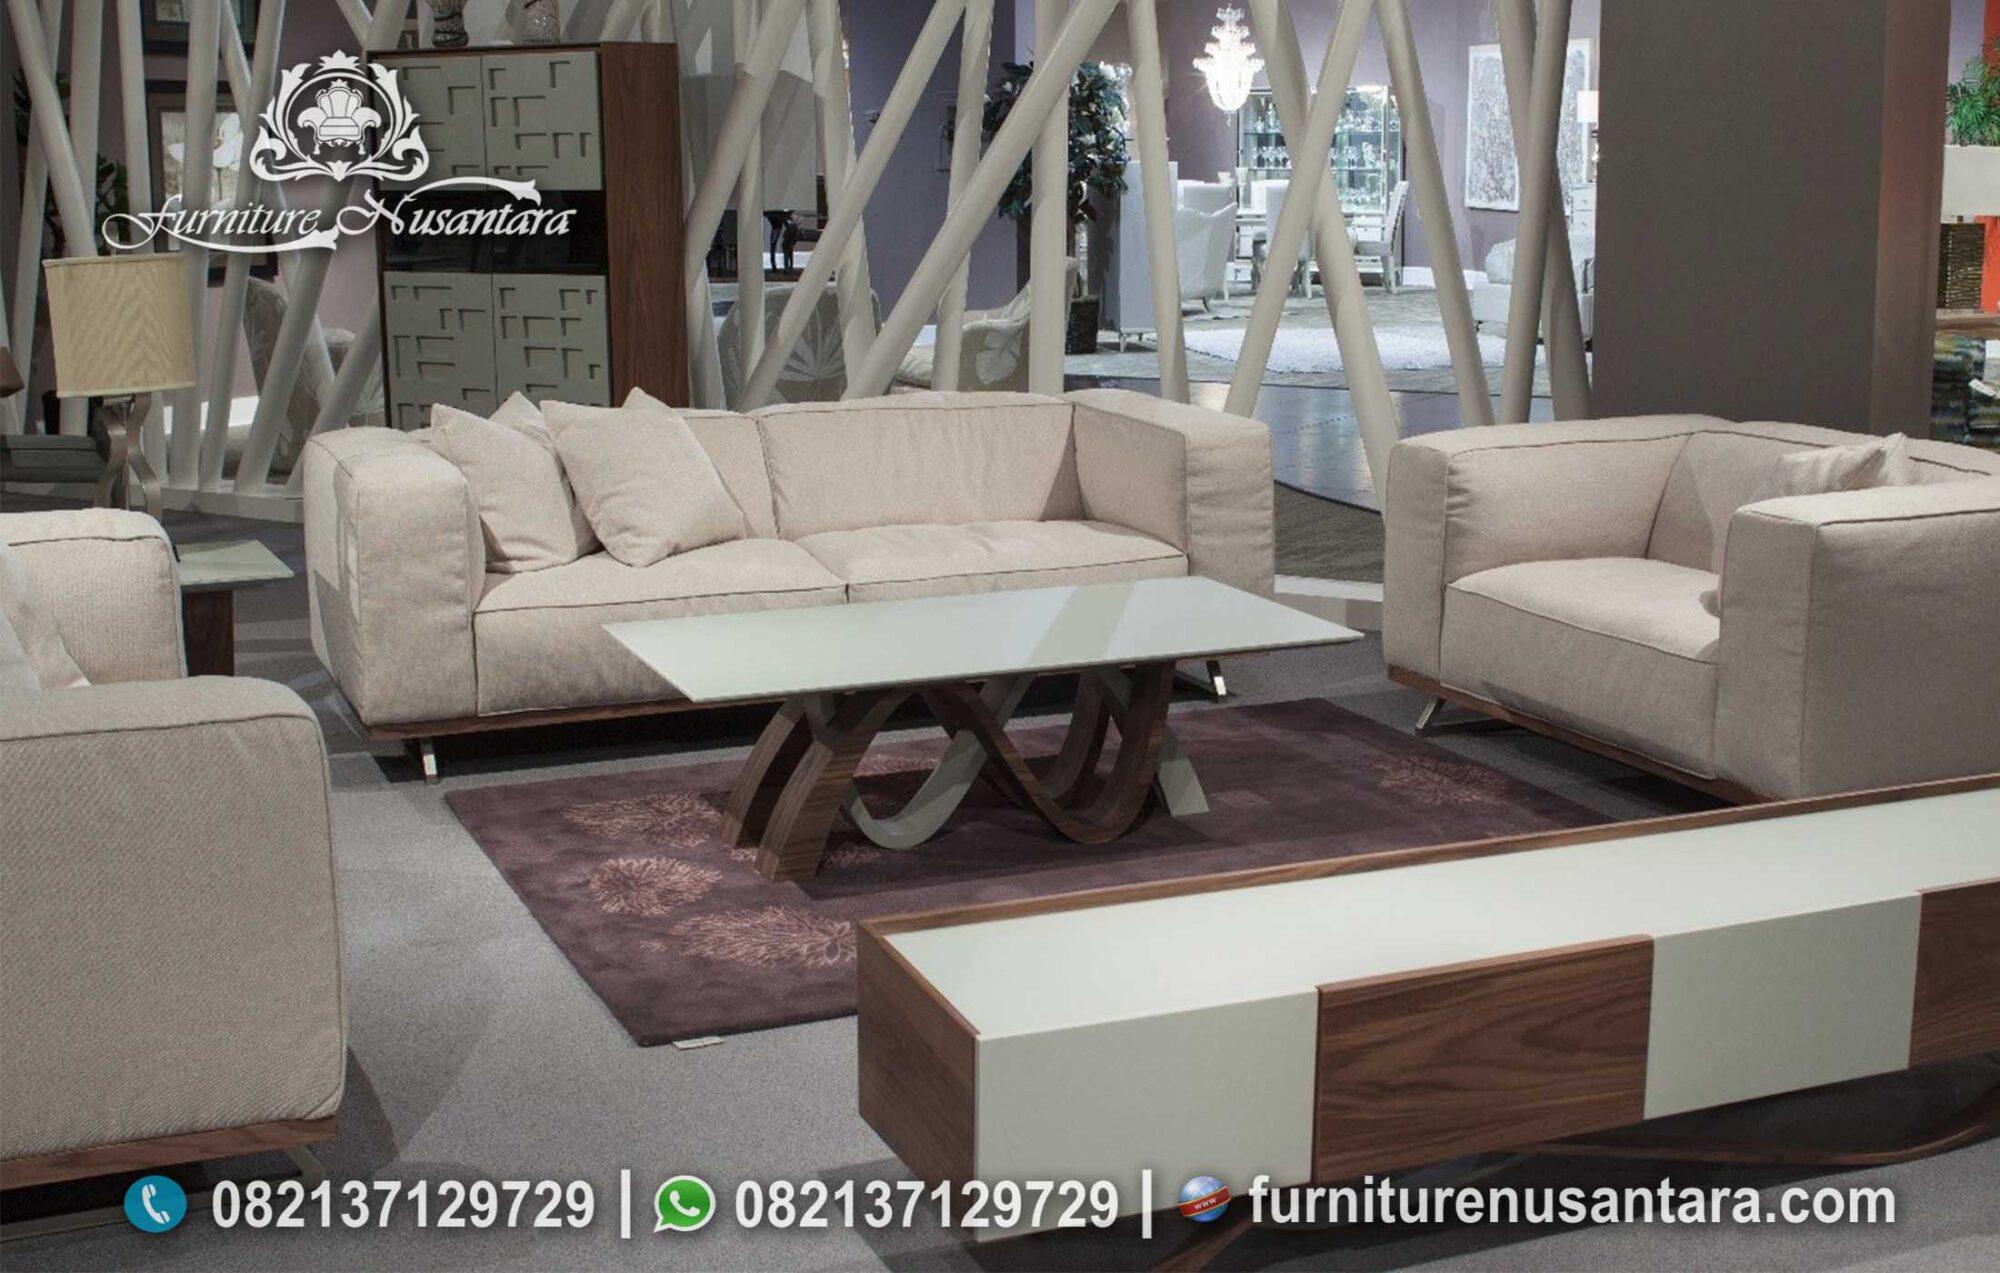 Sofa Tamu Minimalis Warna Soft ST-101, Furniture Nusantara